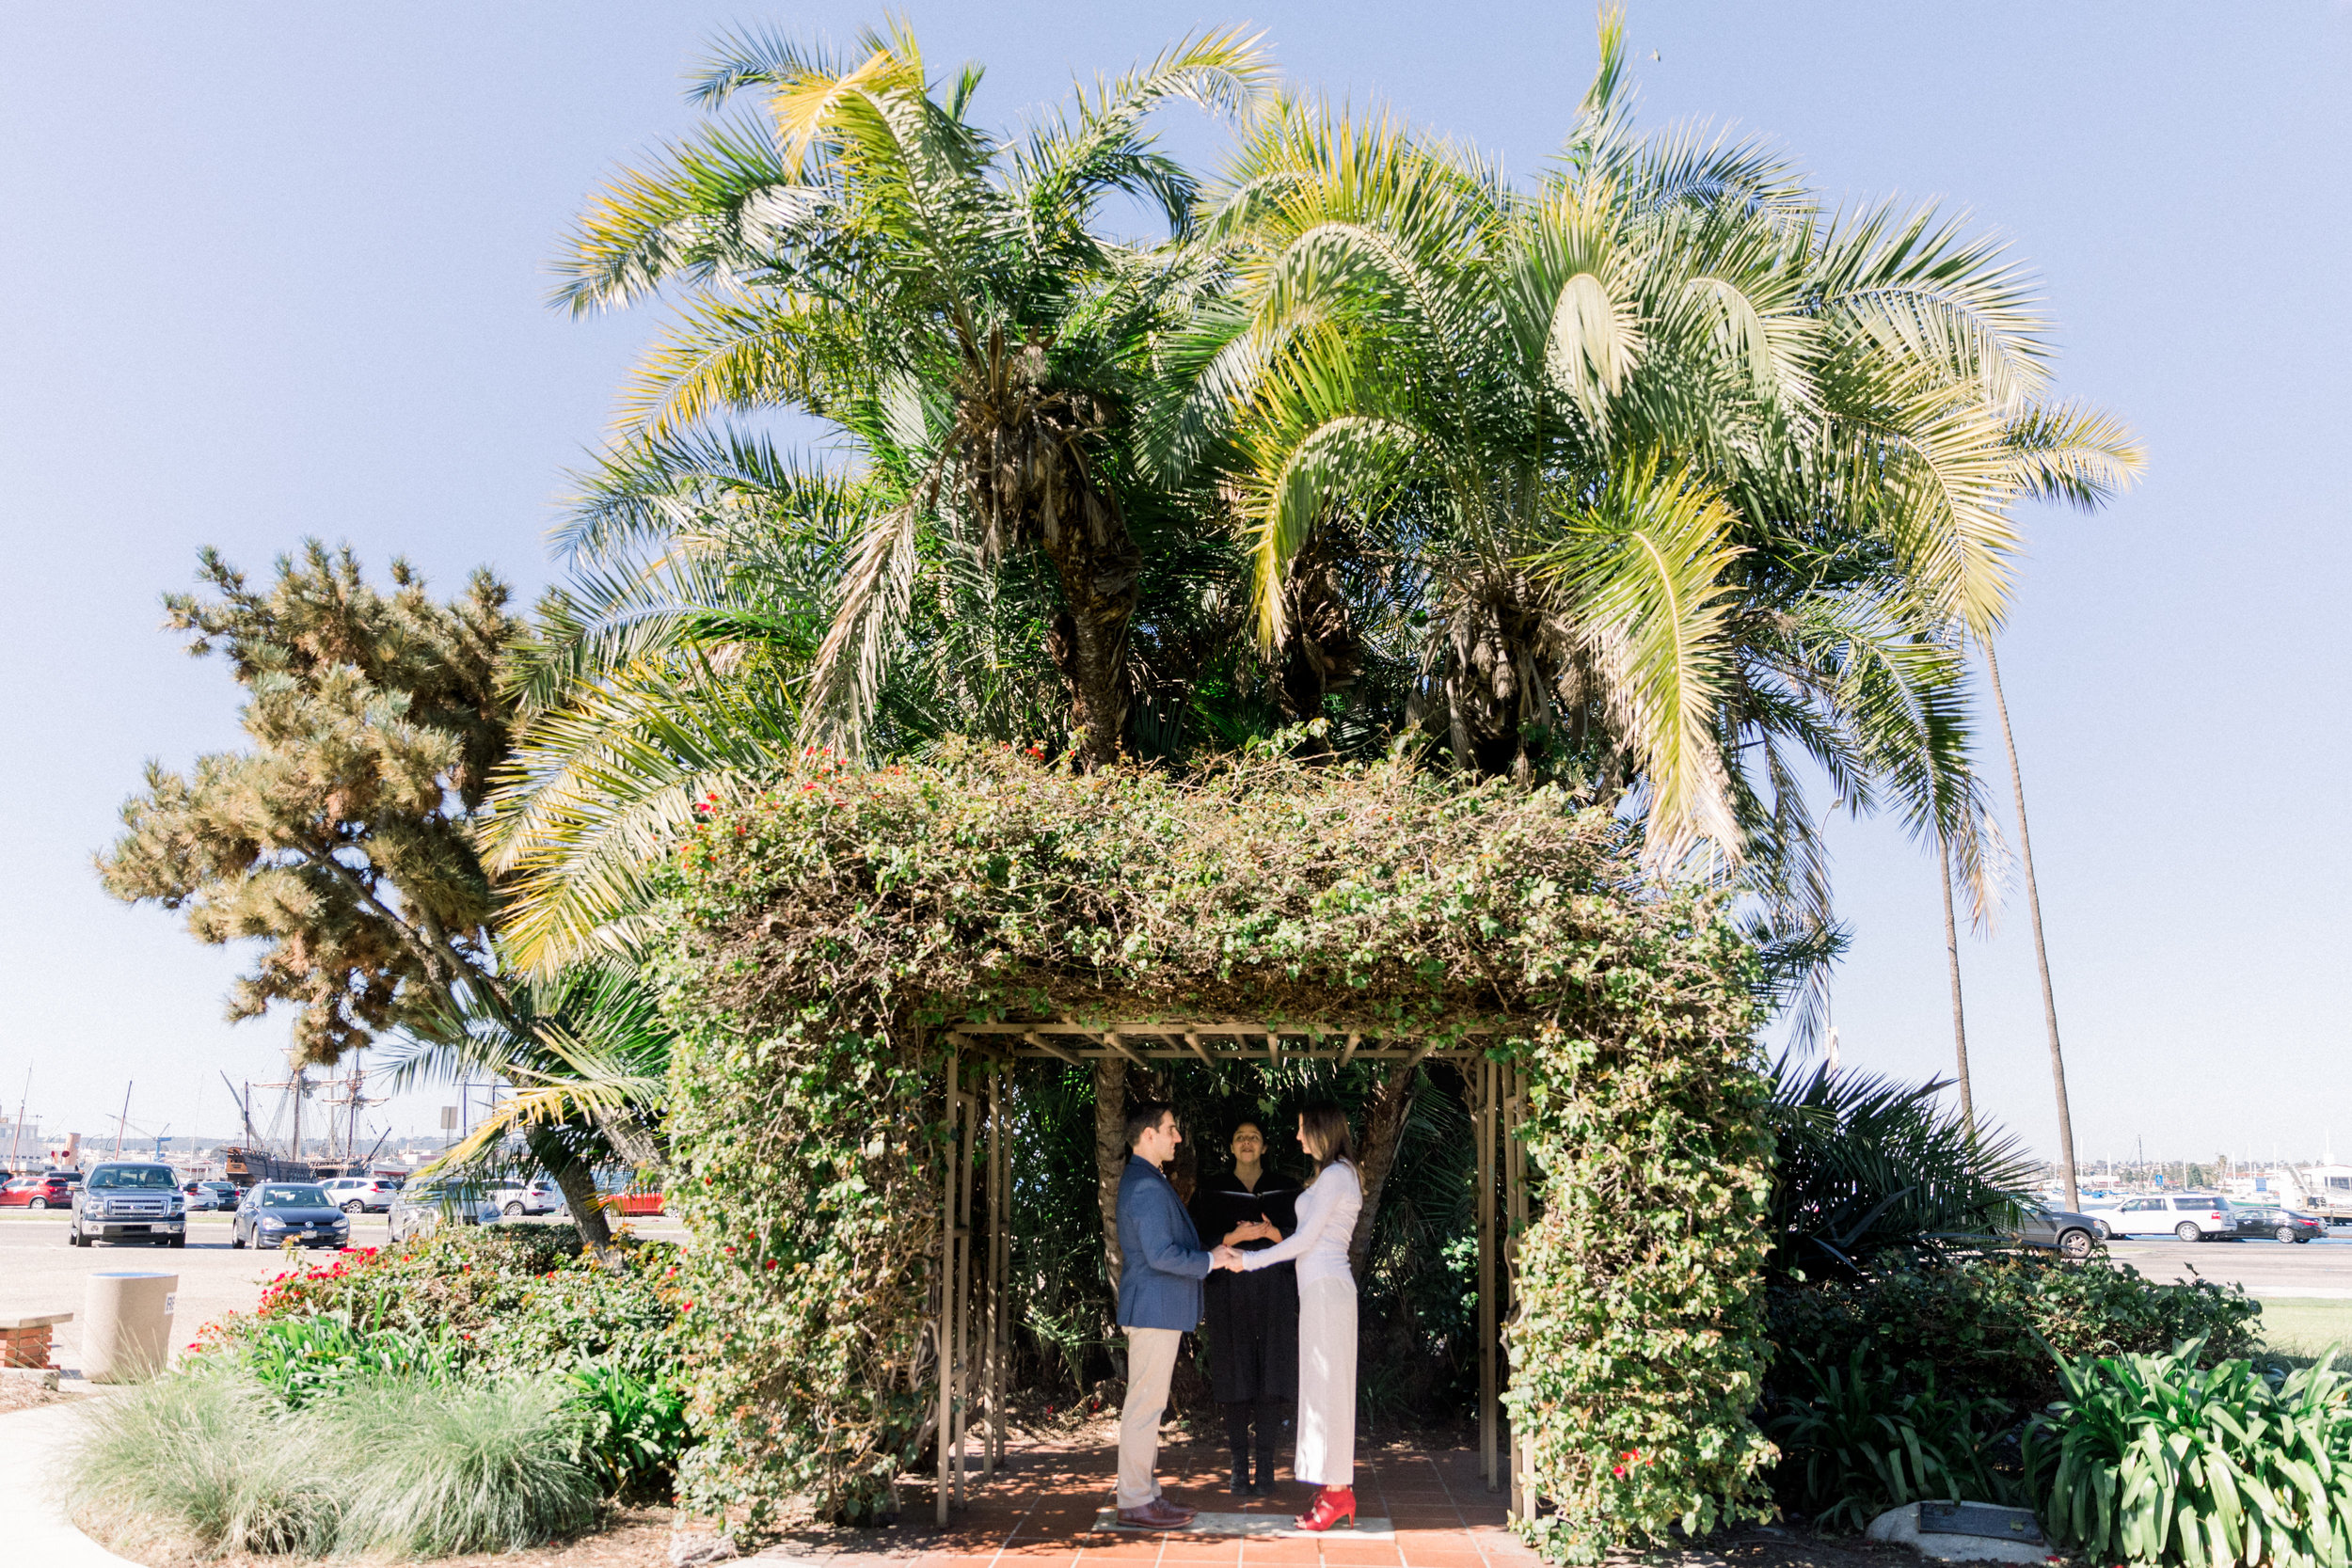 Claire_and_Dan_San_Diego_Administration_Building_Elopement_Alyssa_Boynton_Photography-4.jpg